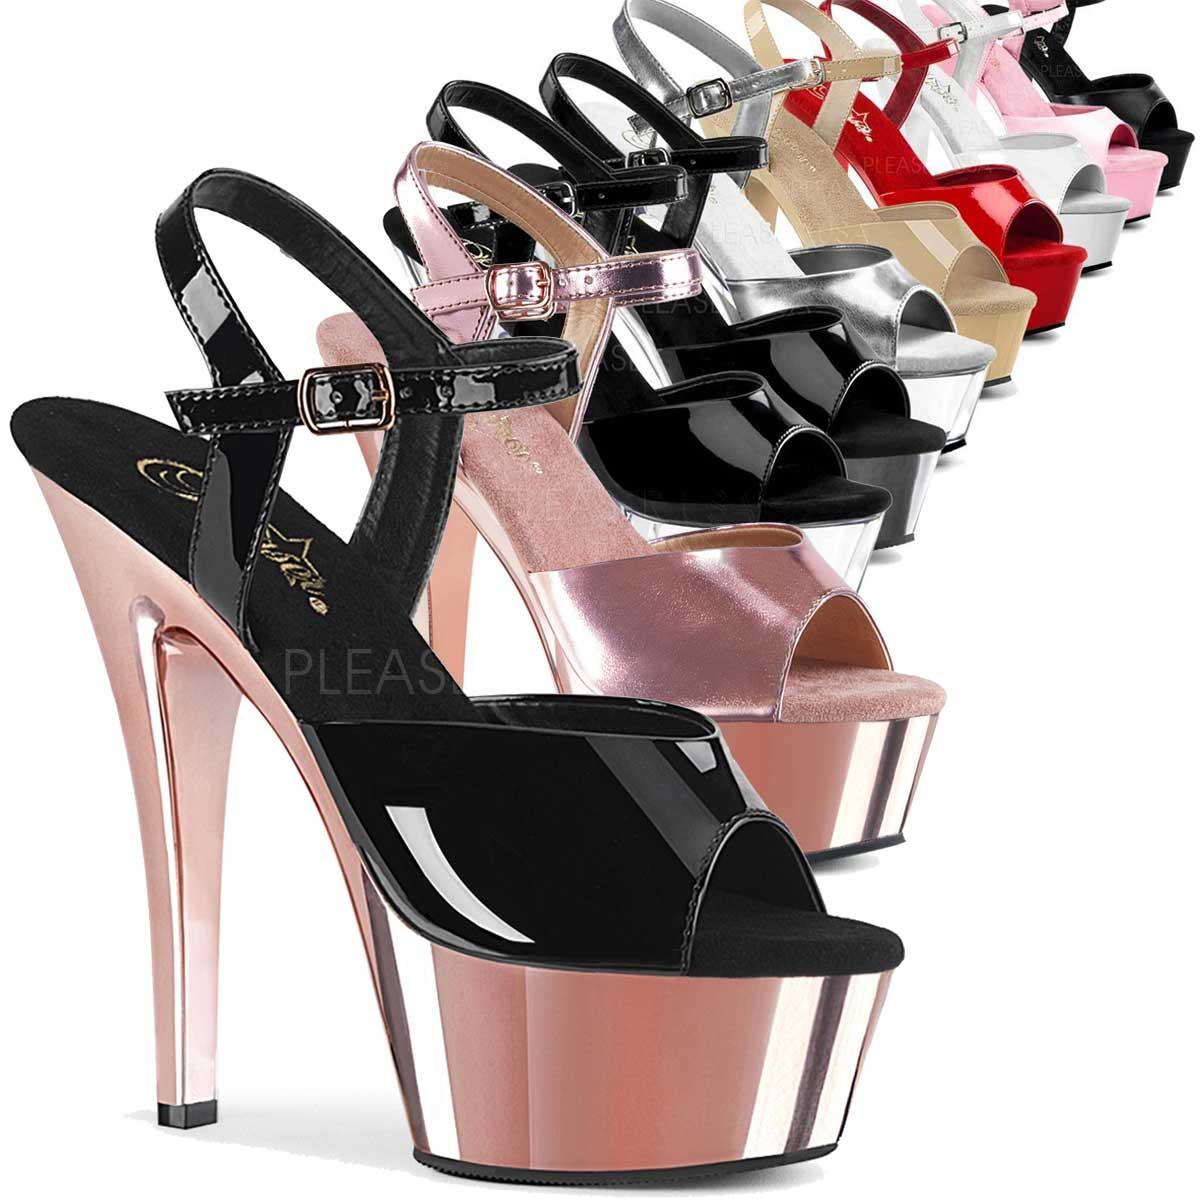 655ea7486ae Pleaser Shoes